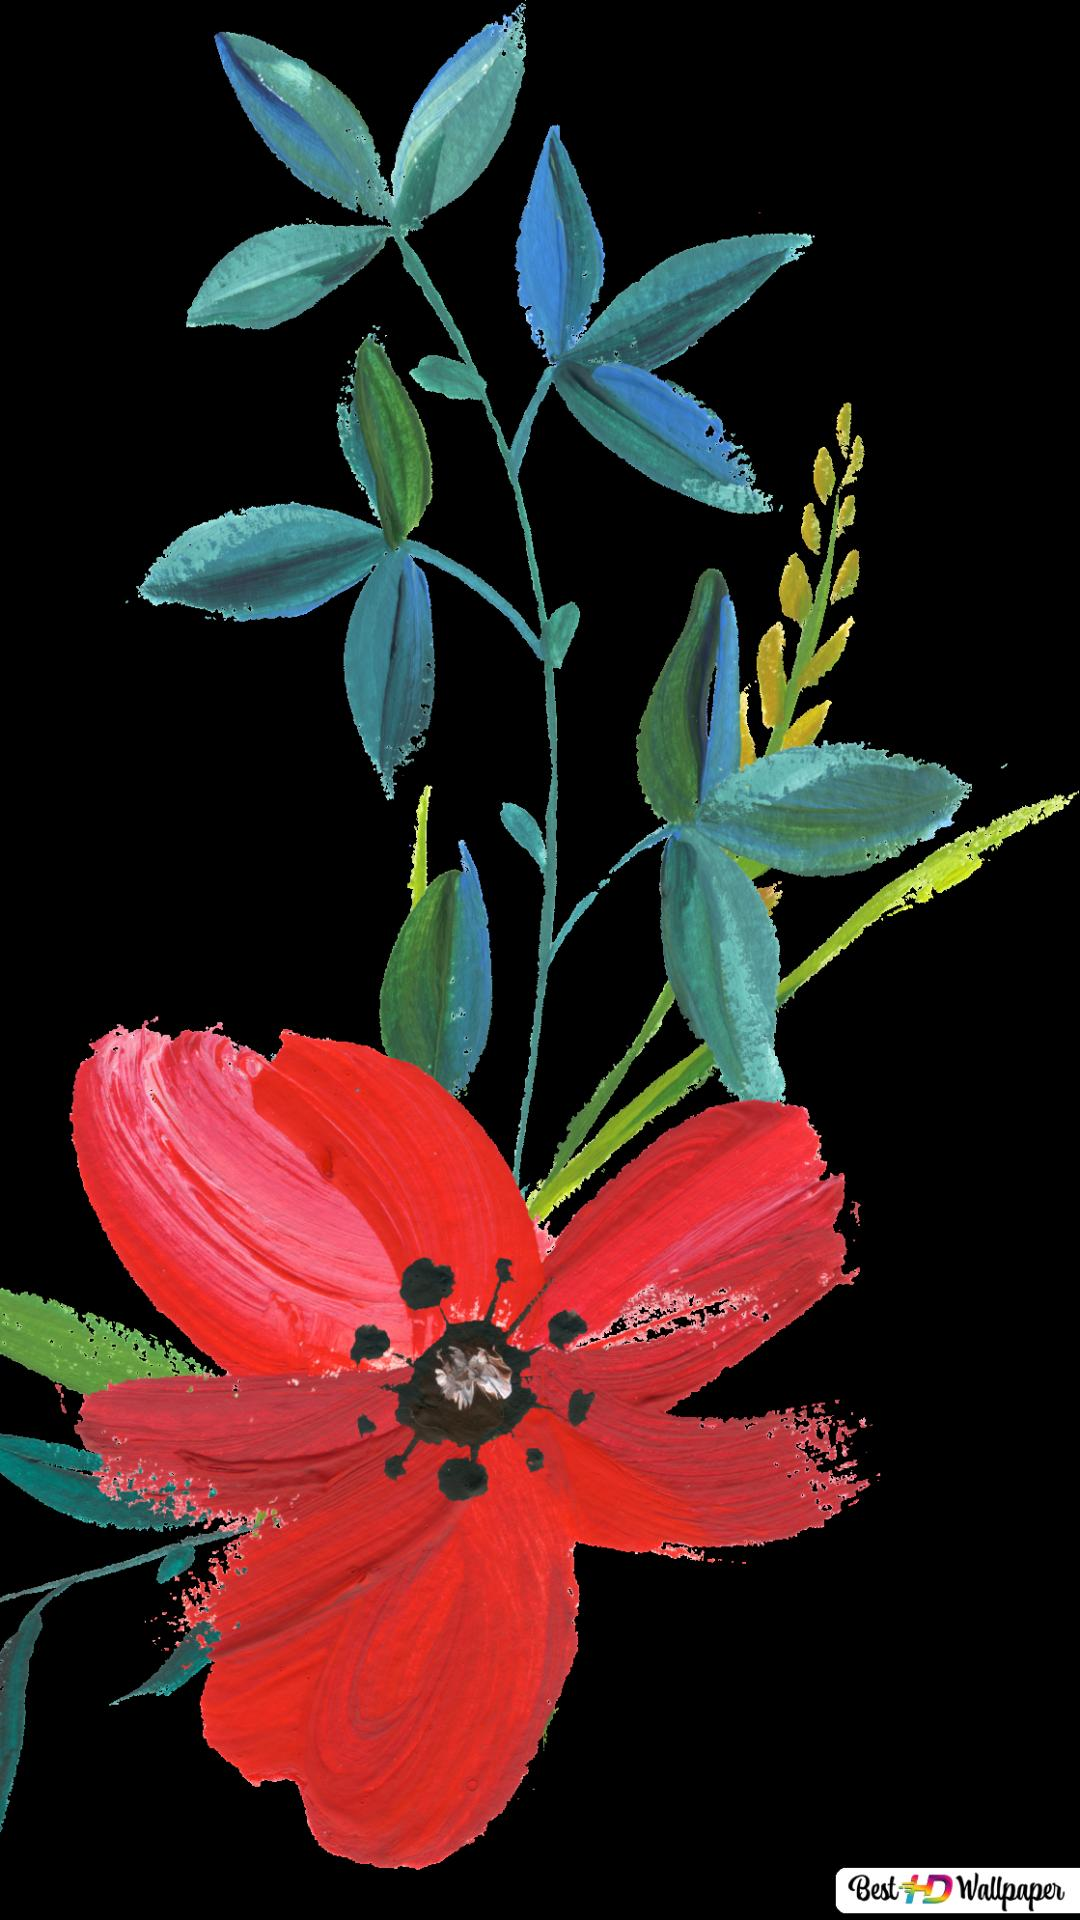 Flower Iphone Black Background Wallpaper